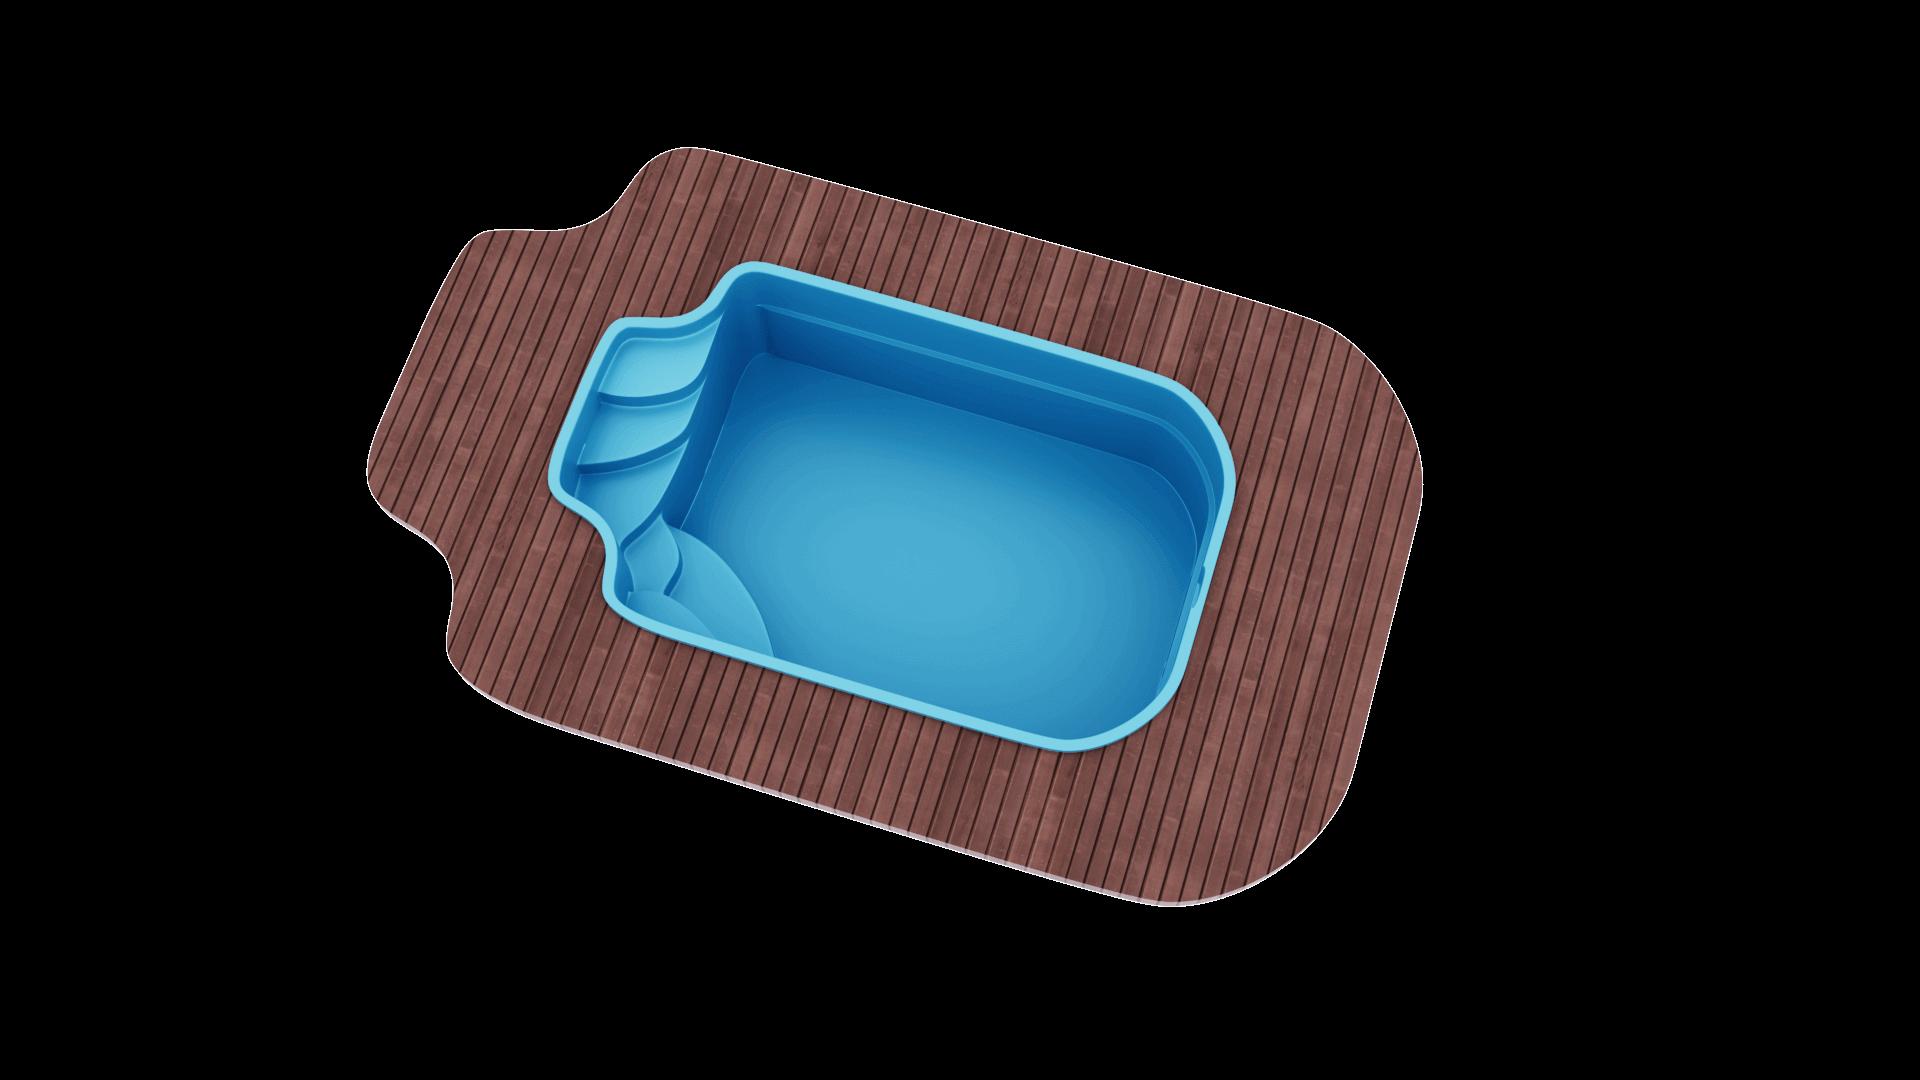 Бассейн 5,0х3,0х1,7